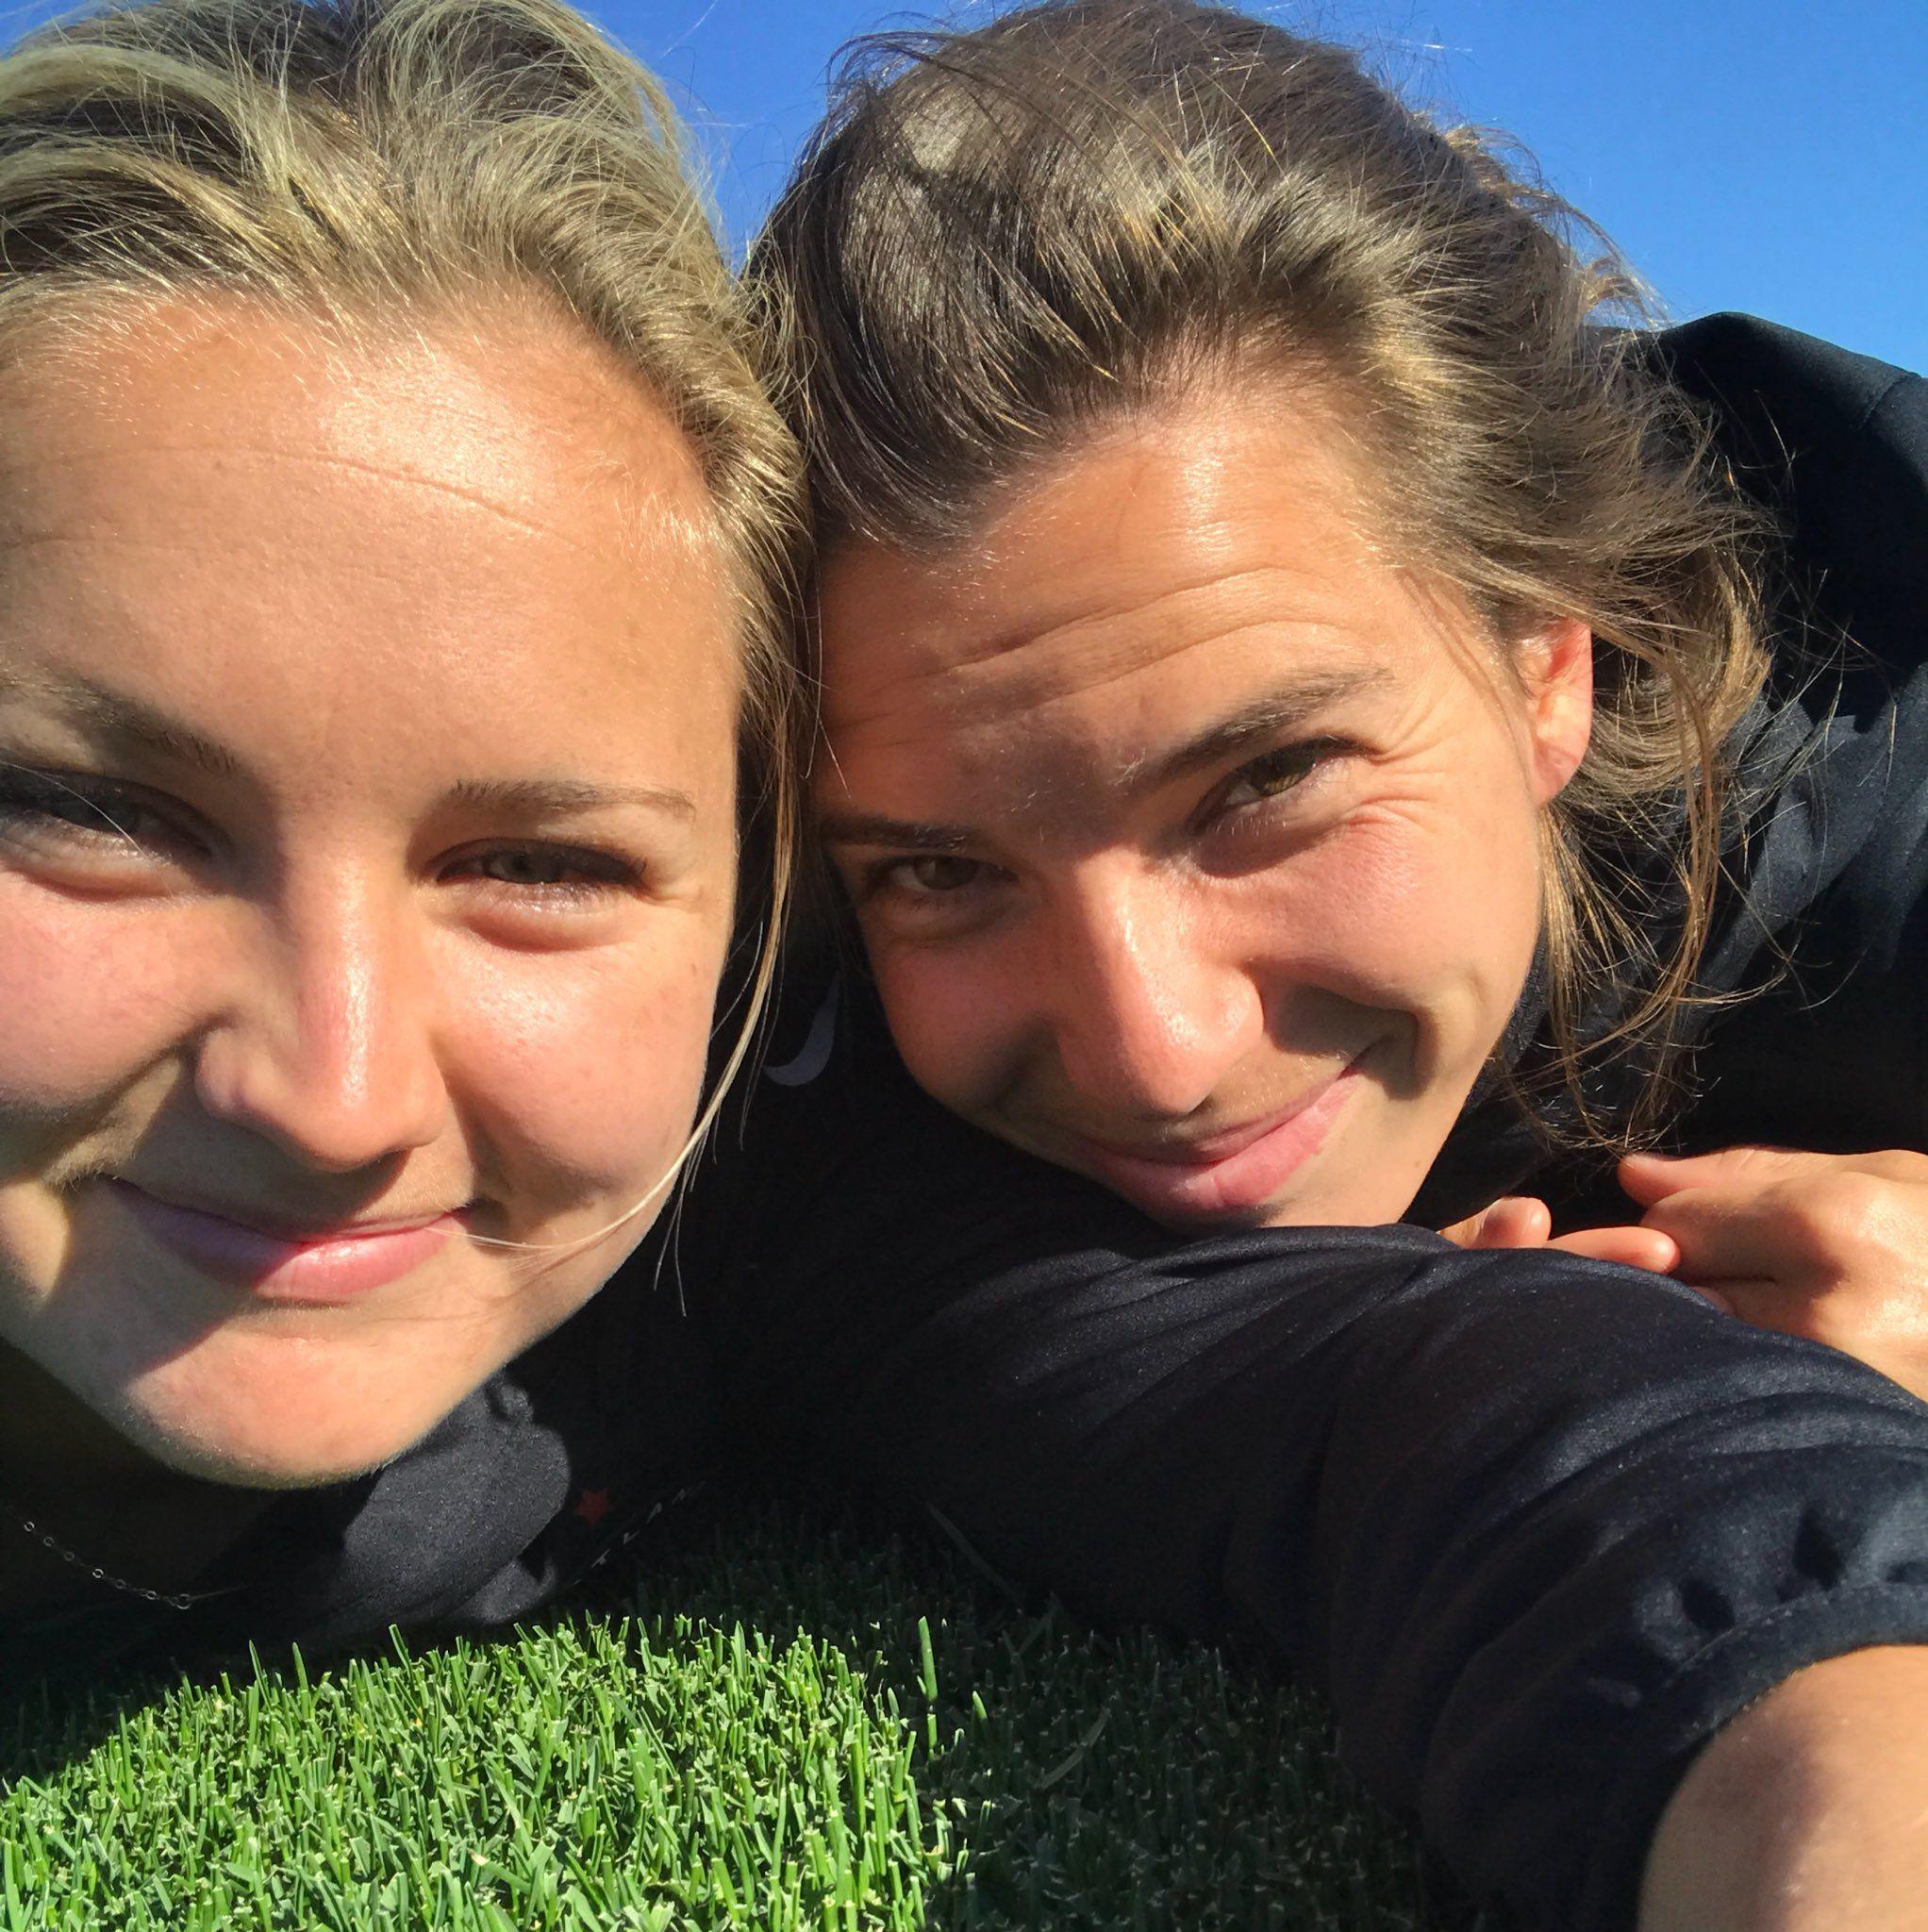 Lindsey Horan on | Tobin Heath | Tobin heath, Soccer